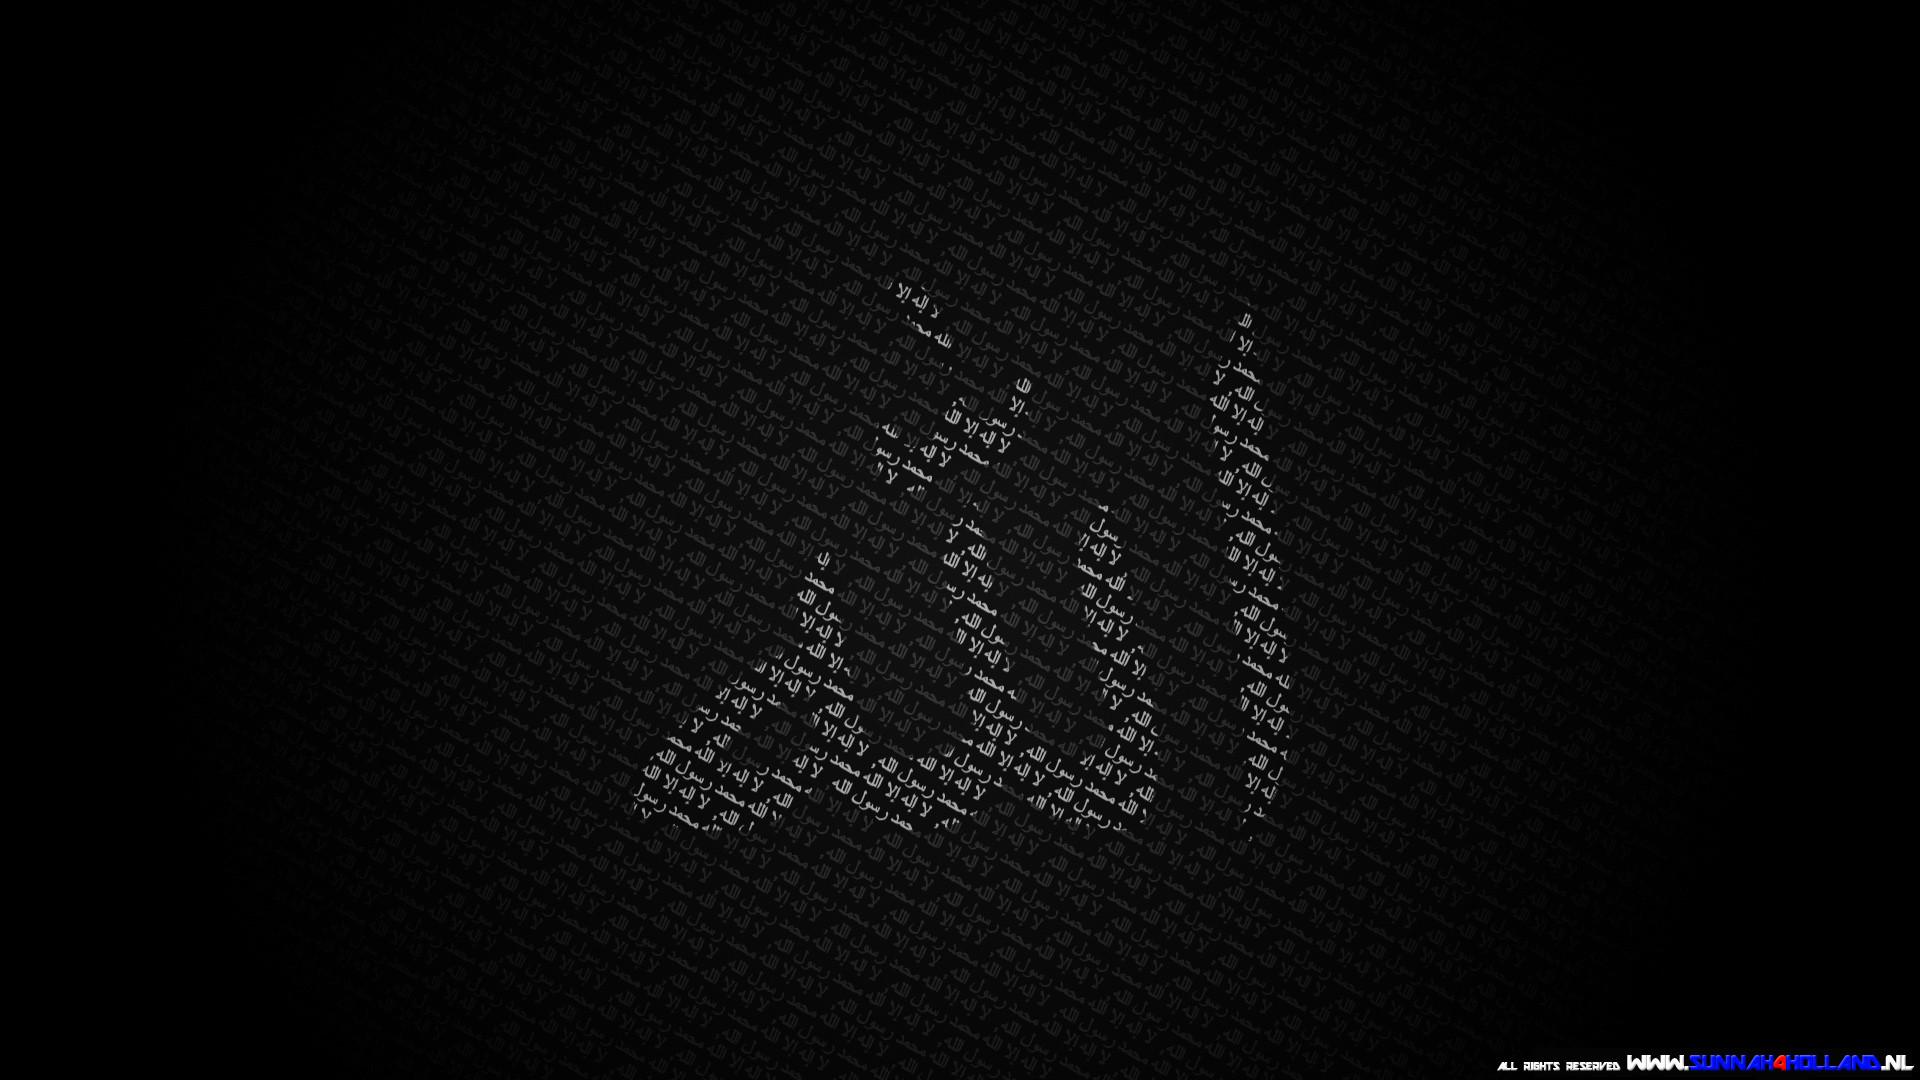 Allah Black Wallpaper HD Widescreen